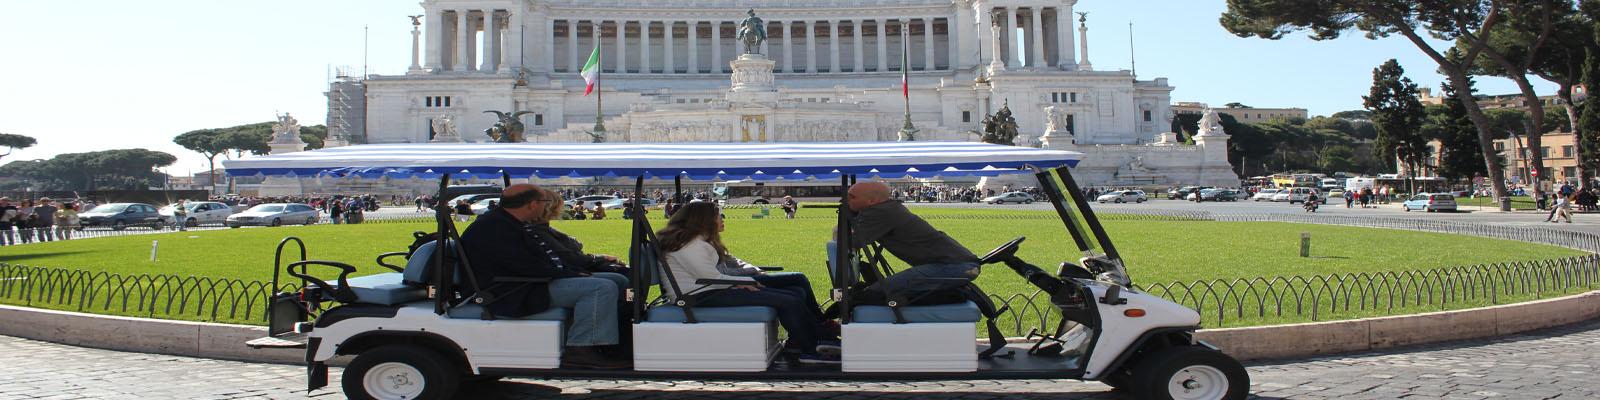 rome by golf-cart tour